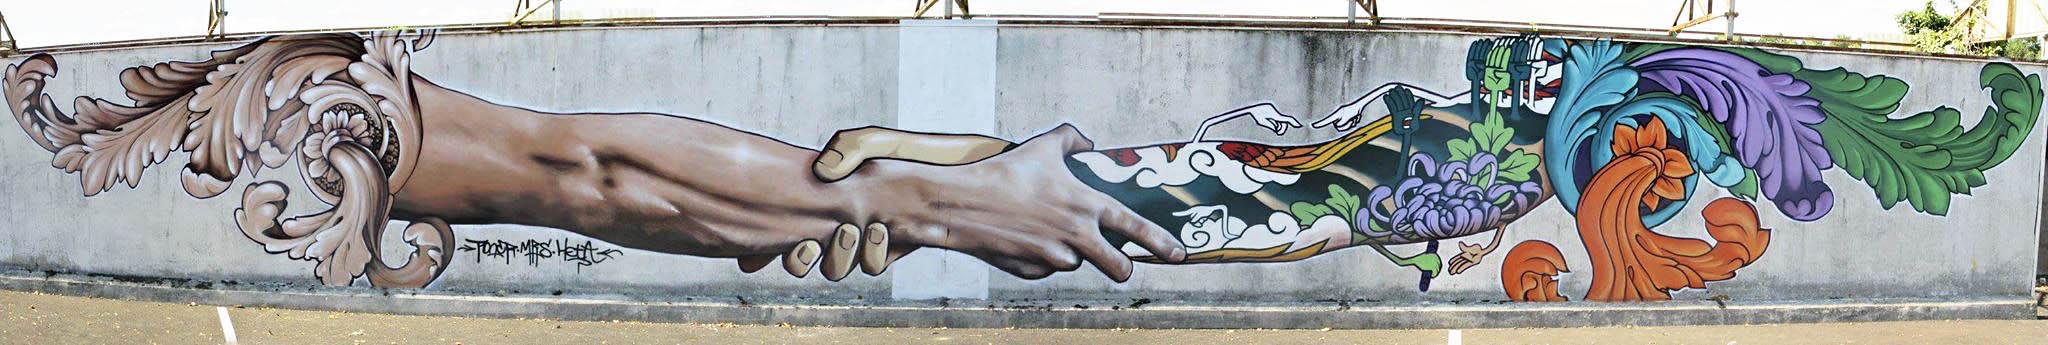 Toner-Heta-Monsieur-S-fresque